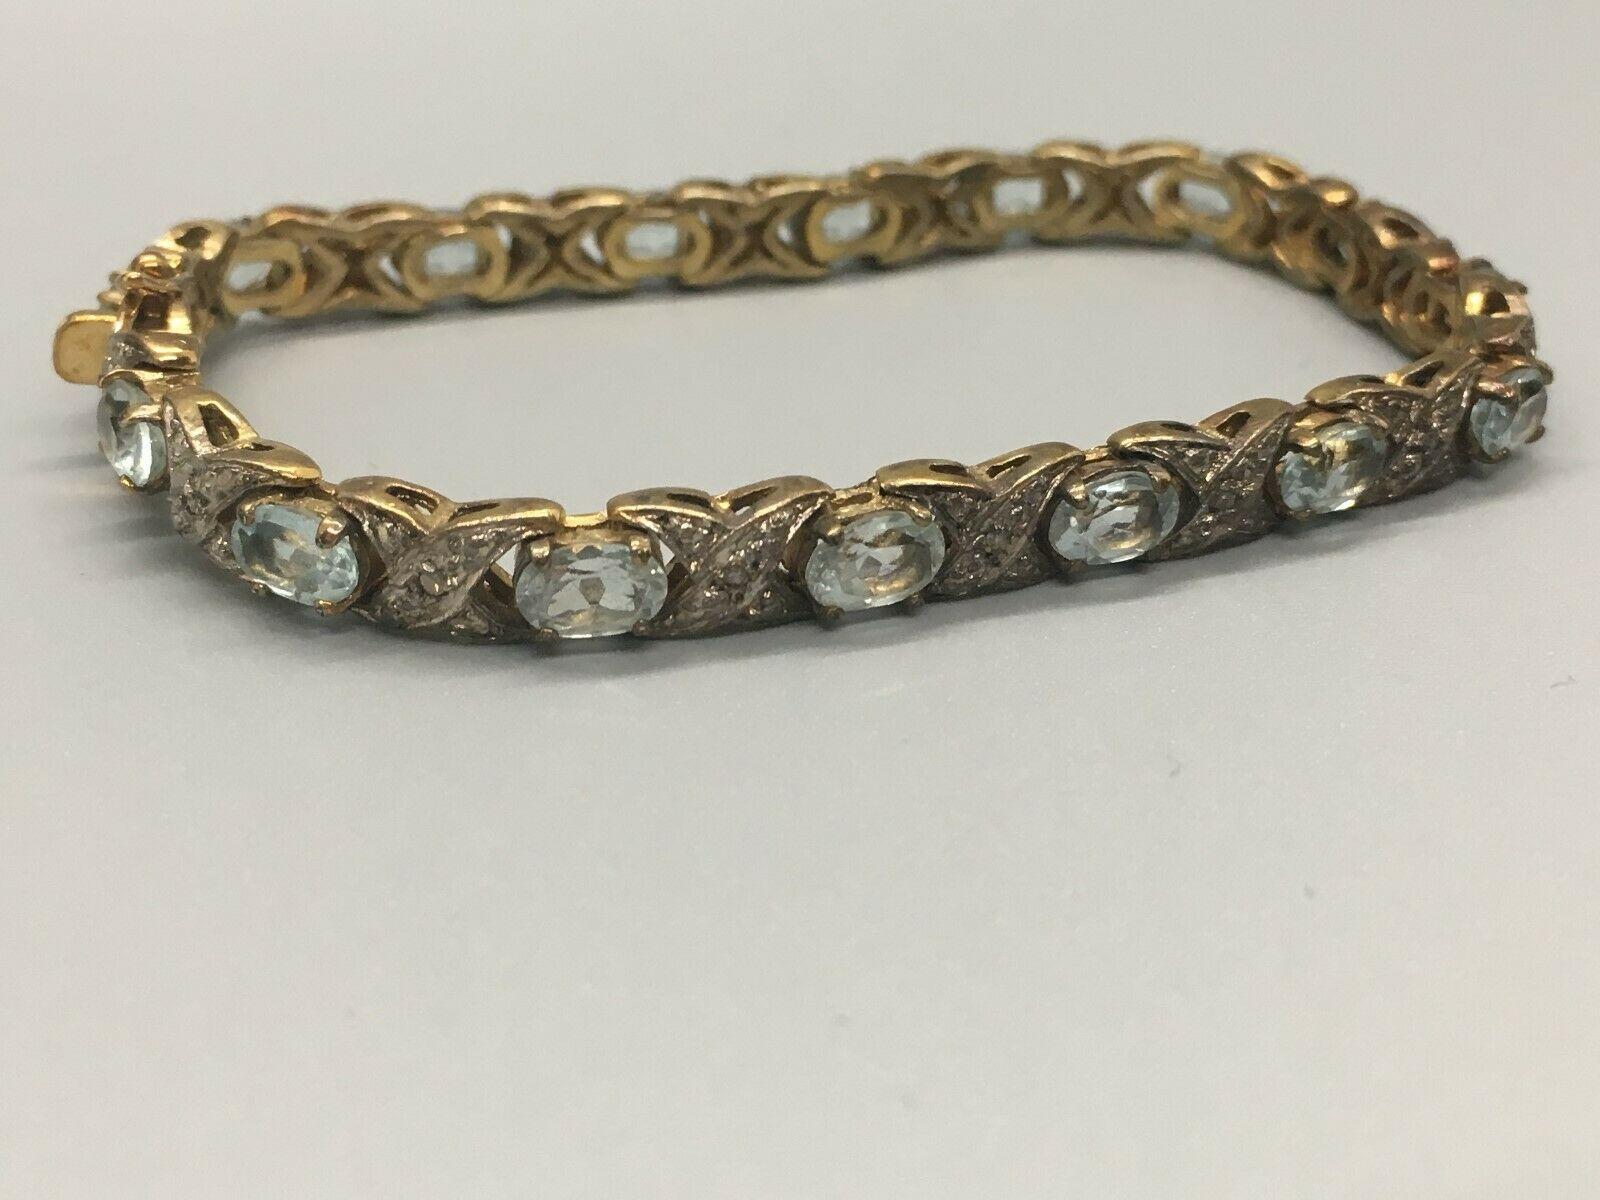 "Pretty Vintage 7"" Sterling Silver and Blue Topaz Bracelet Signed XOX image 2"